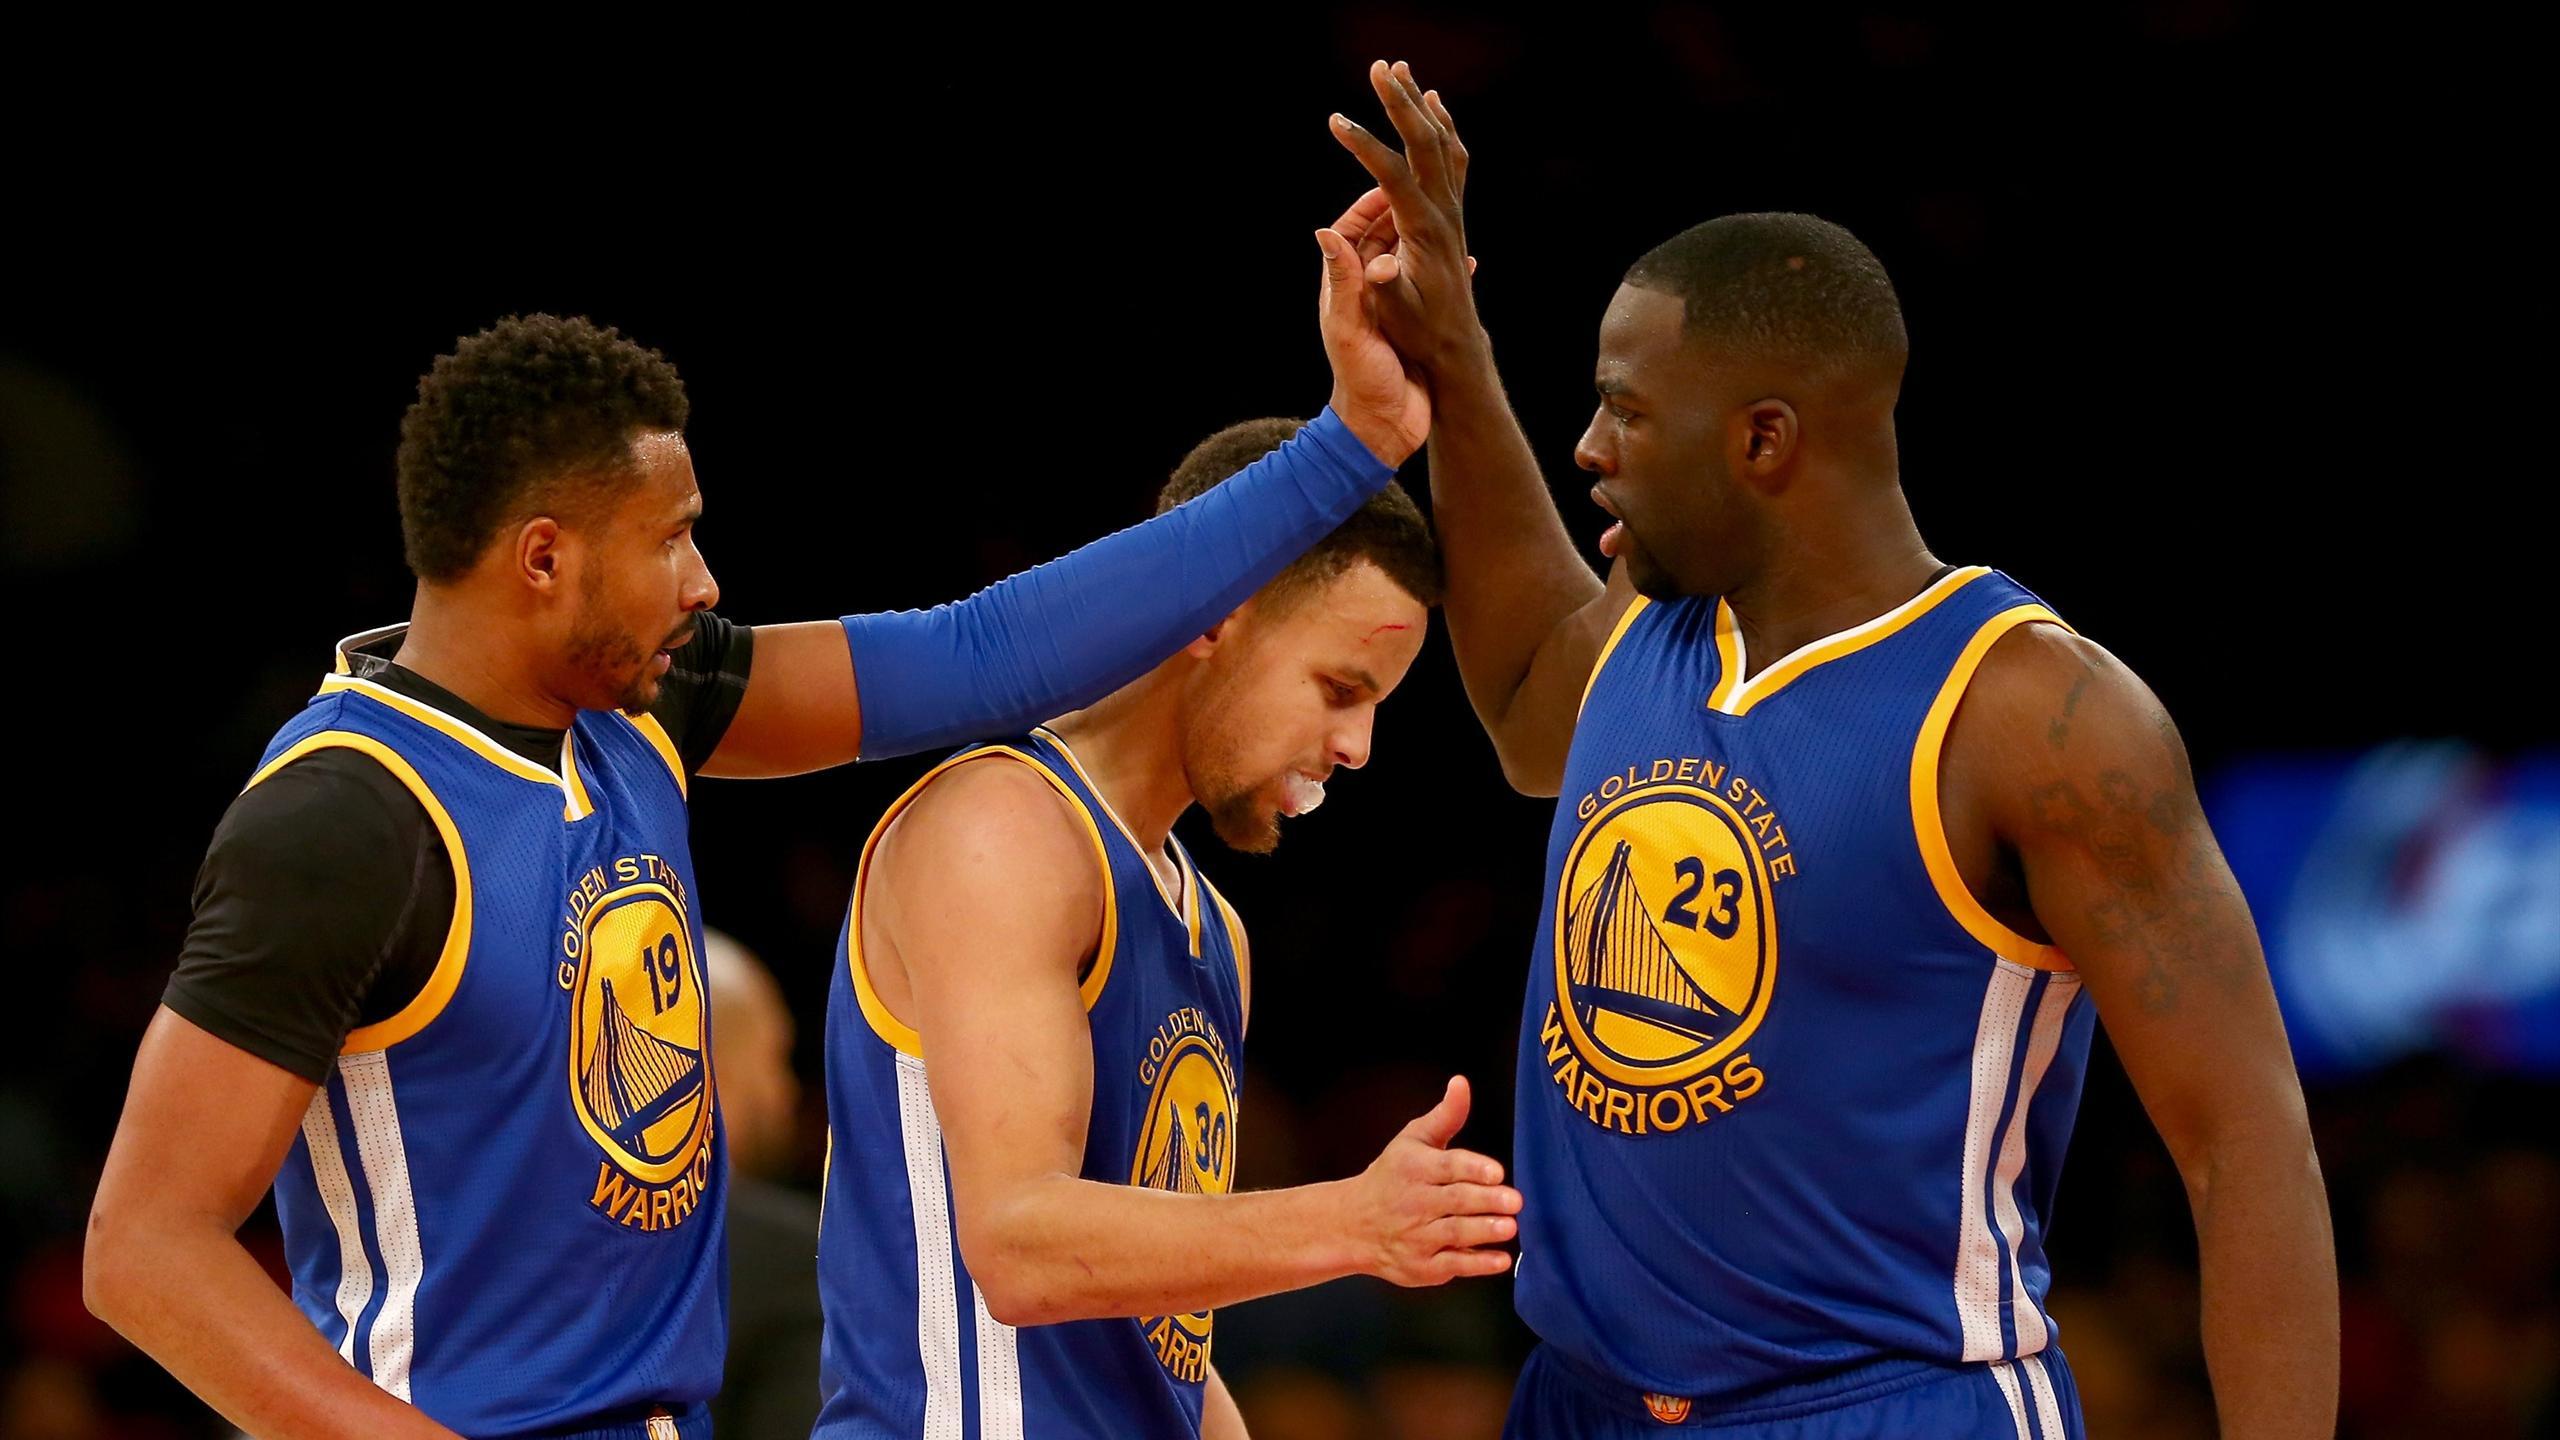 Leandro Barbosa, Stephen Curry et Draymond Green lors de New York Knicks - Golden State le 31 janvier 2016